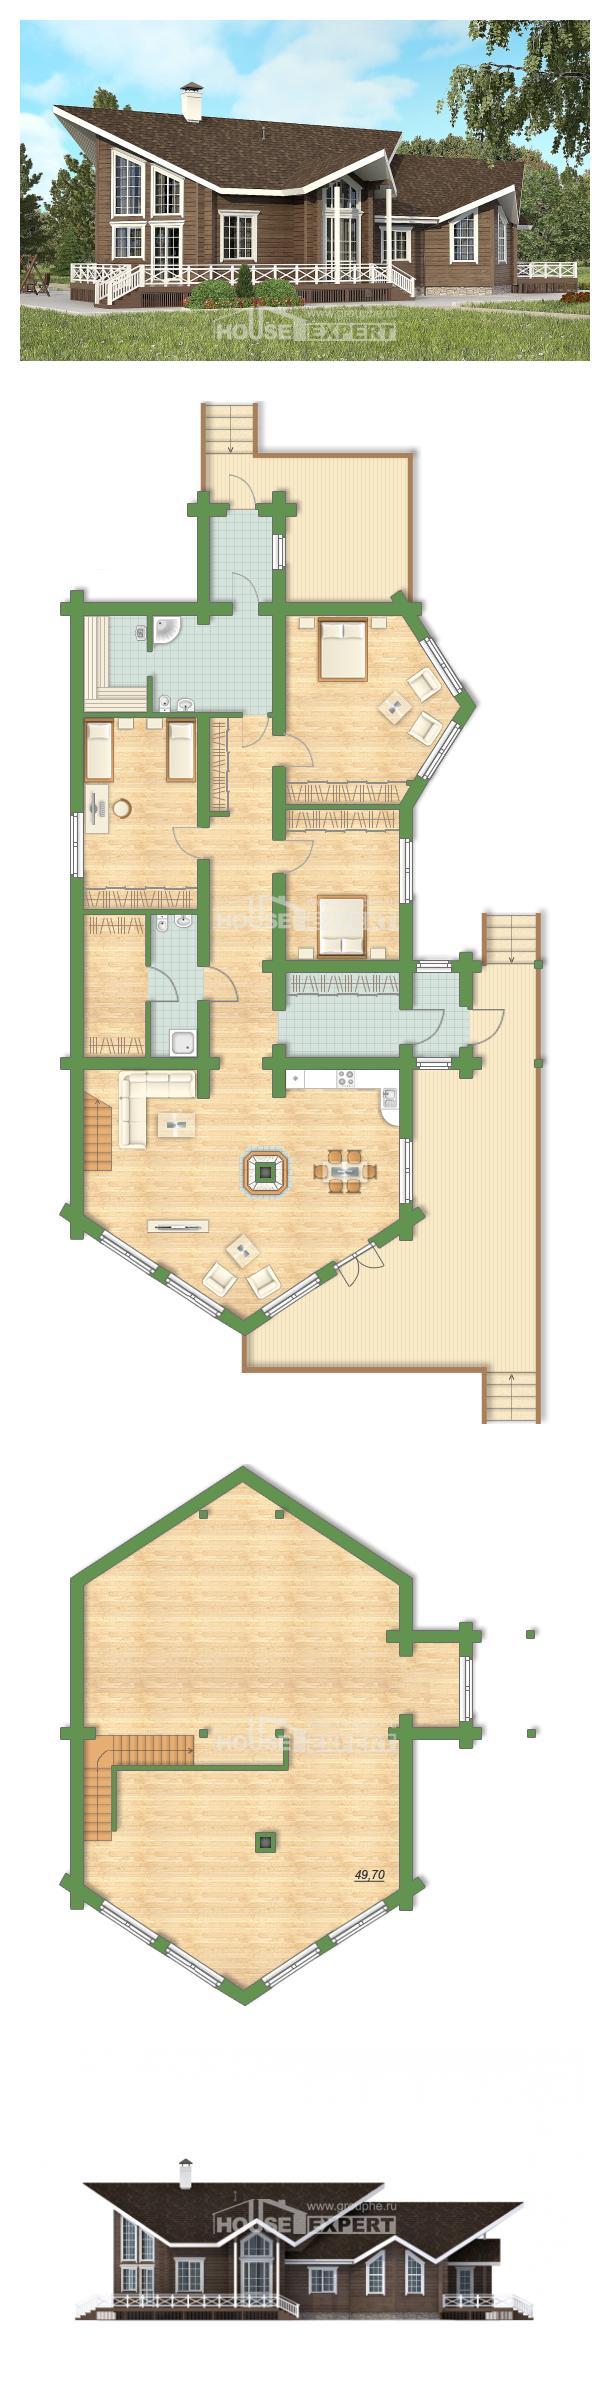 Проект дома 210-002-Л | House Expert